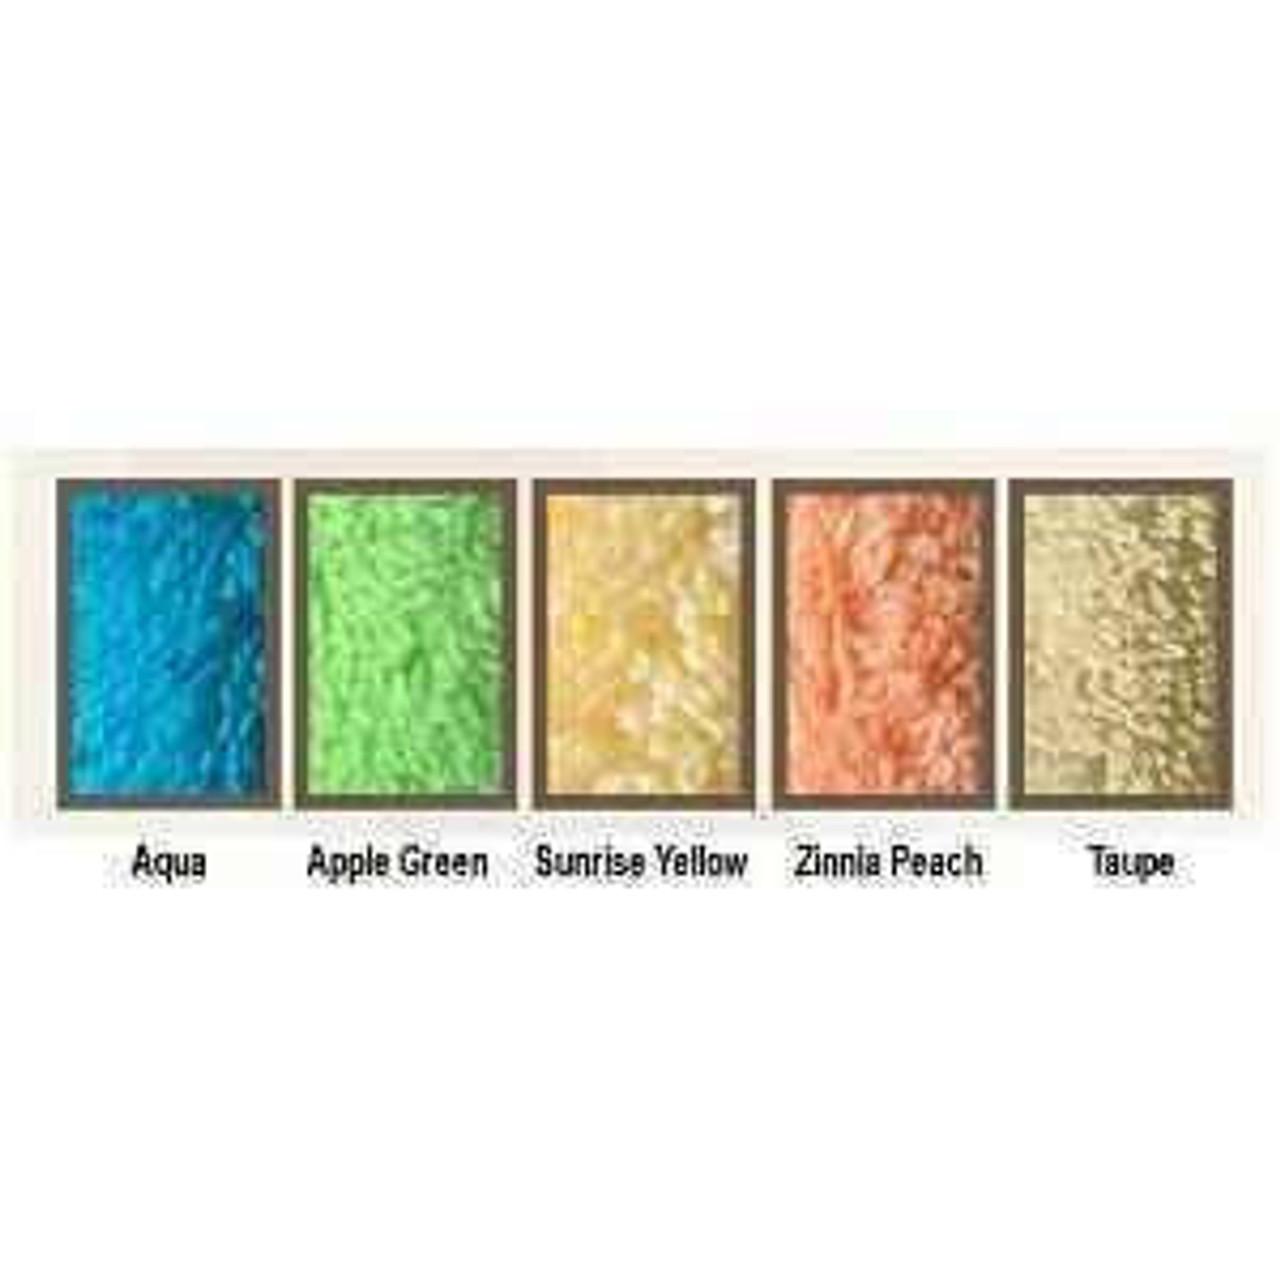 Ganesh Mills or Oxford Super Blend Ganesh Mills or Beach Towels or Pack of 2 DZ